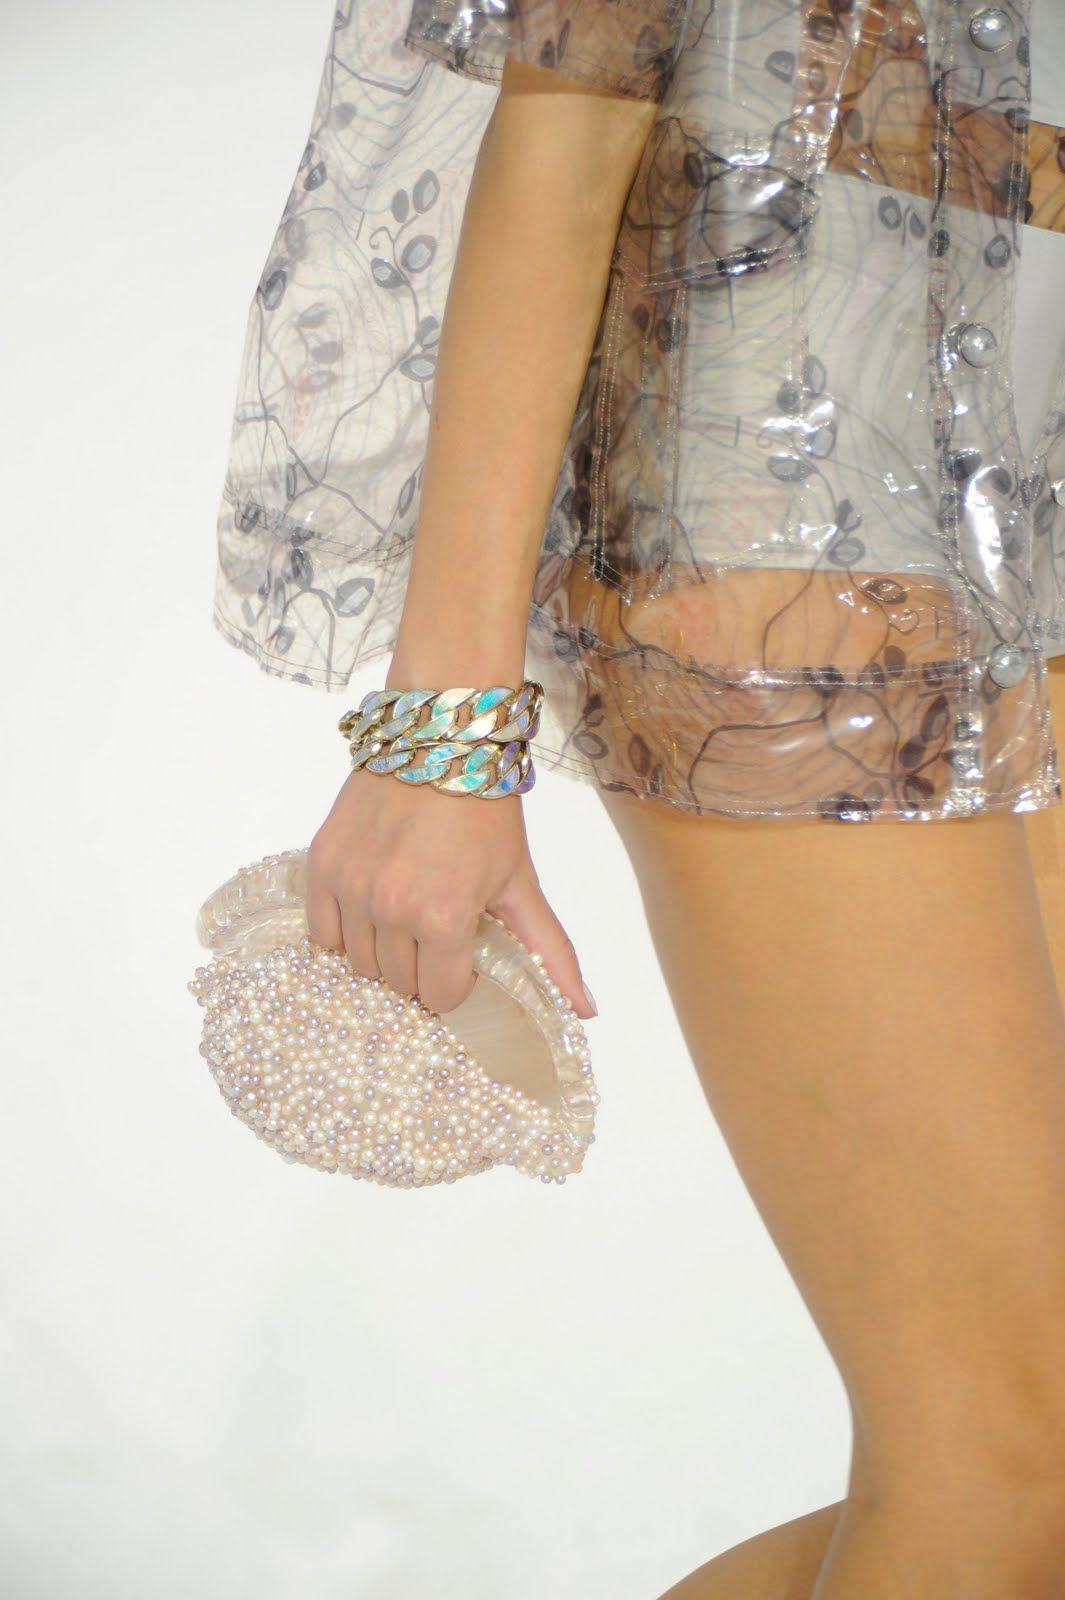 dress - Shell chanels clutch video